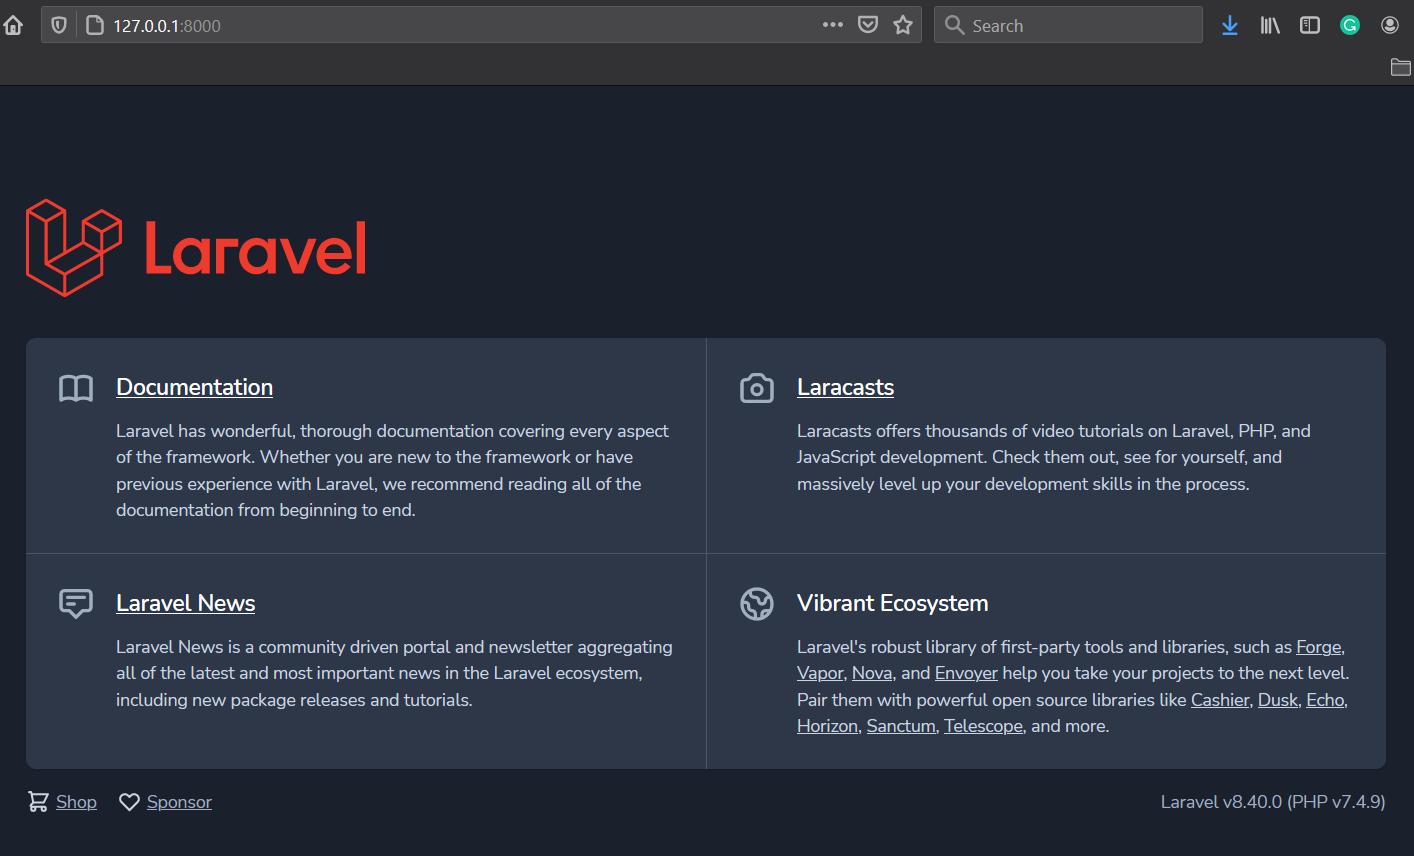 MVC CRUD Operations Using Laravel 8 - Home Page